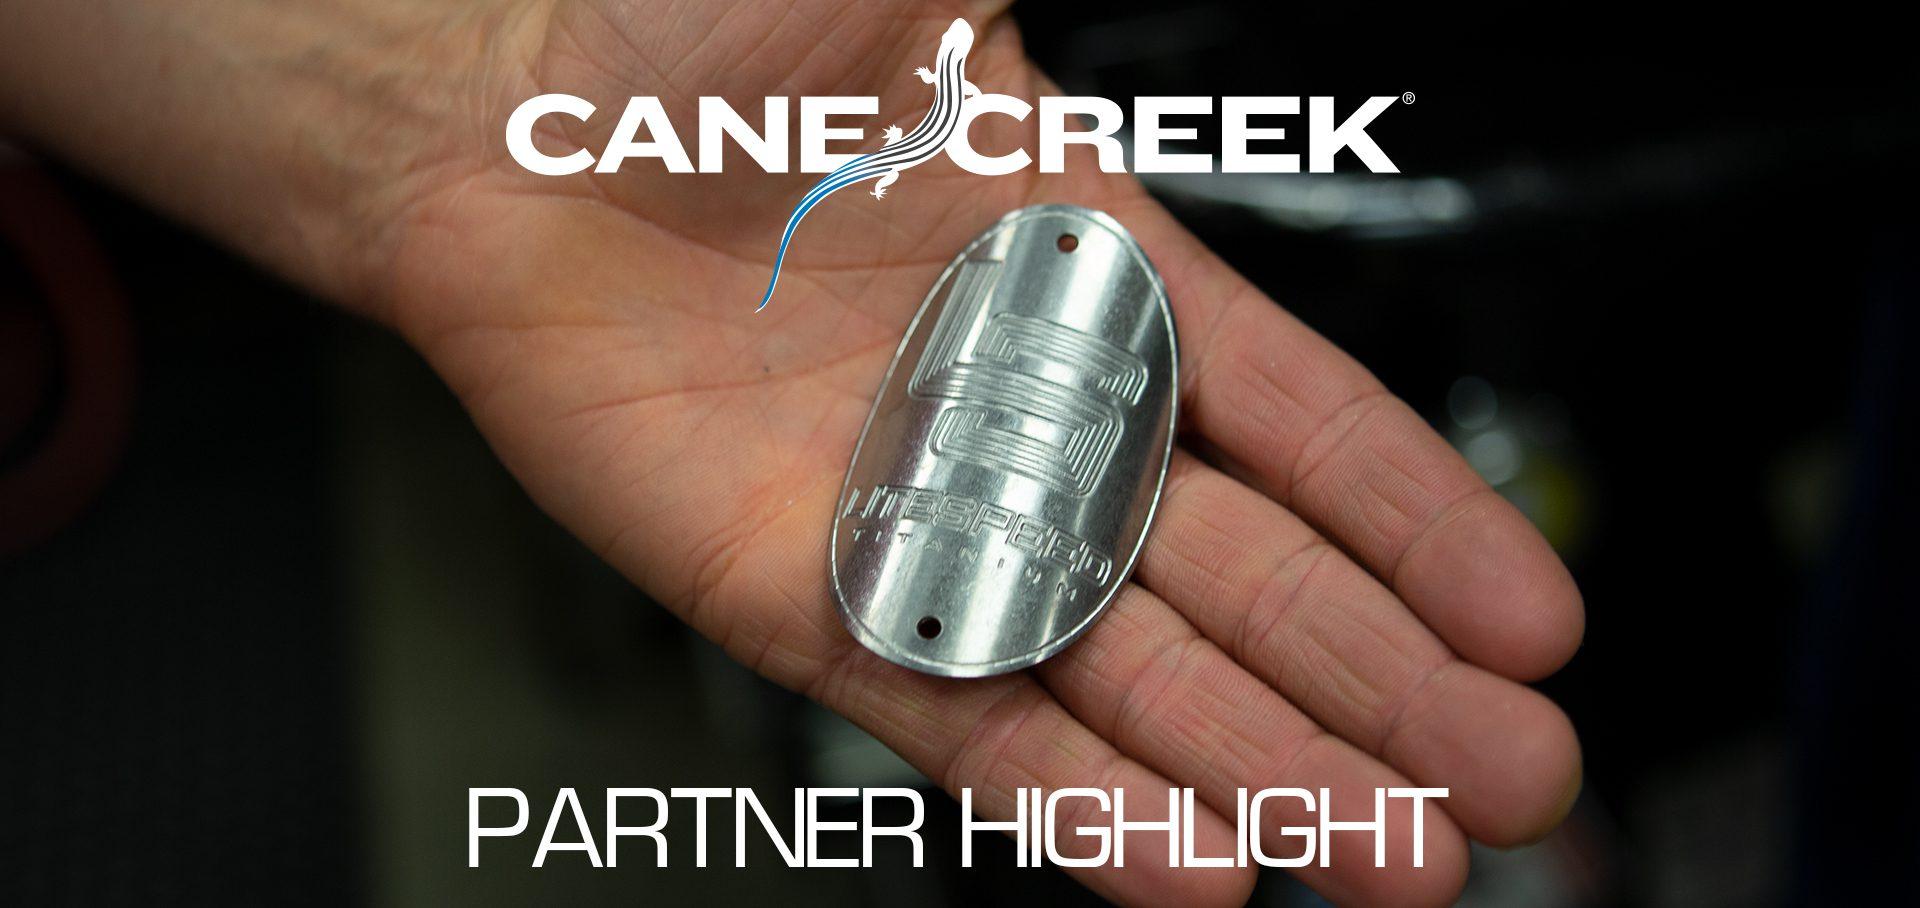 Cane Creek Partner Highlight: Litespeed & Quintana Roo